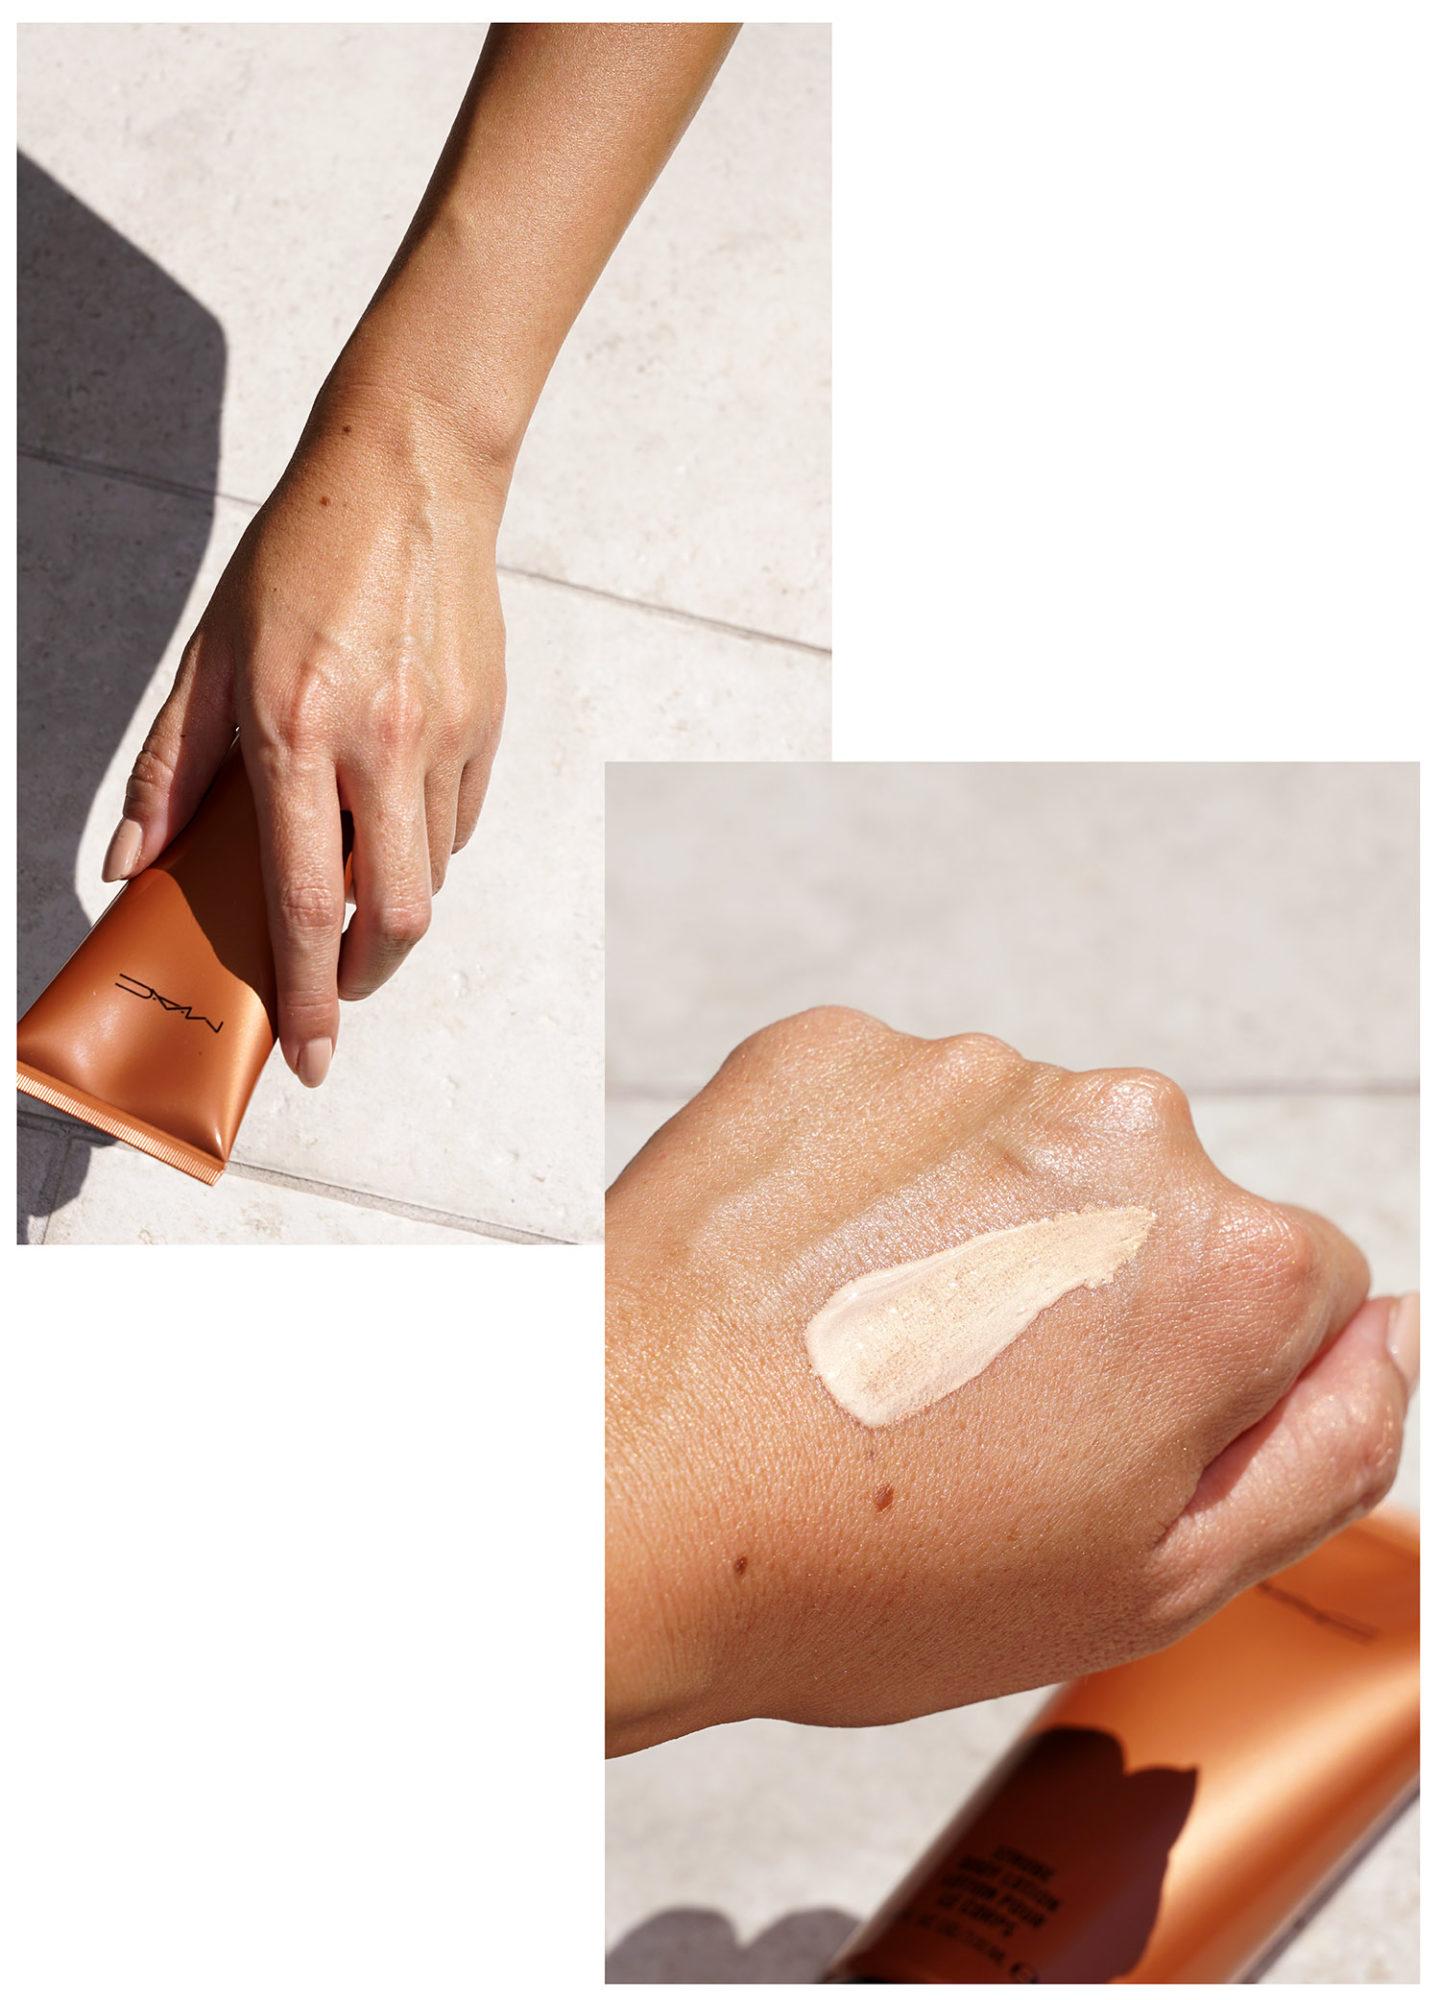 MAC Strobe Body Lotion Summer Bronzelite